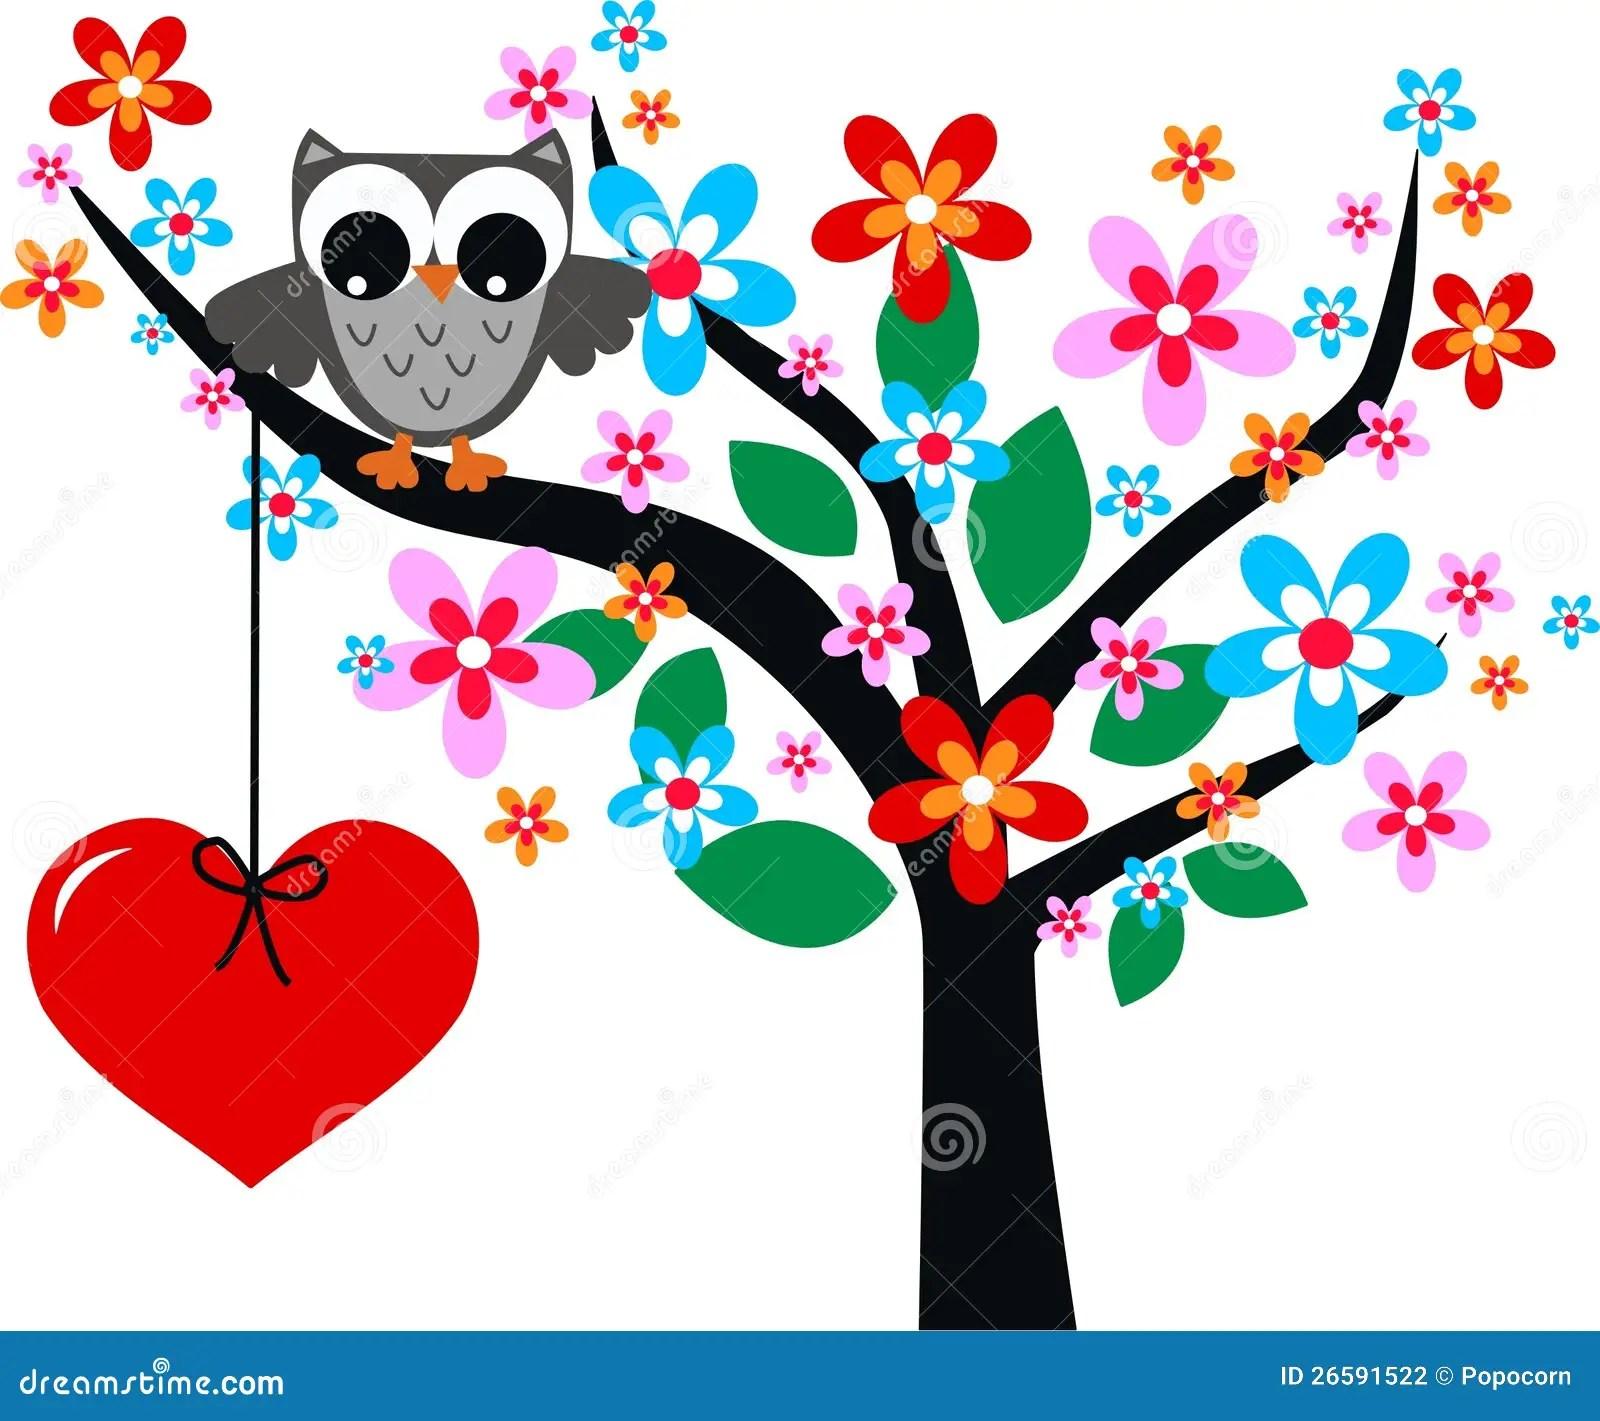 Cute Owl Cartoon Wallpaper Valentines Day Or Birthday Stock Illustration